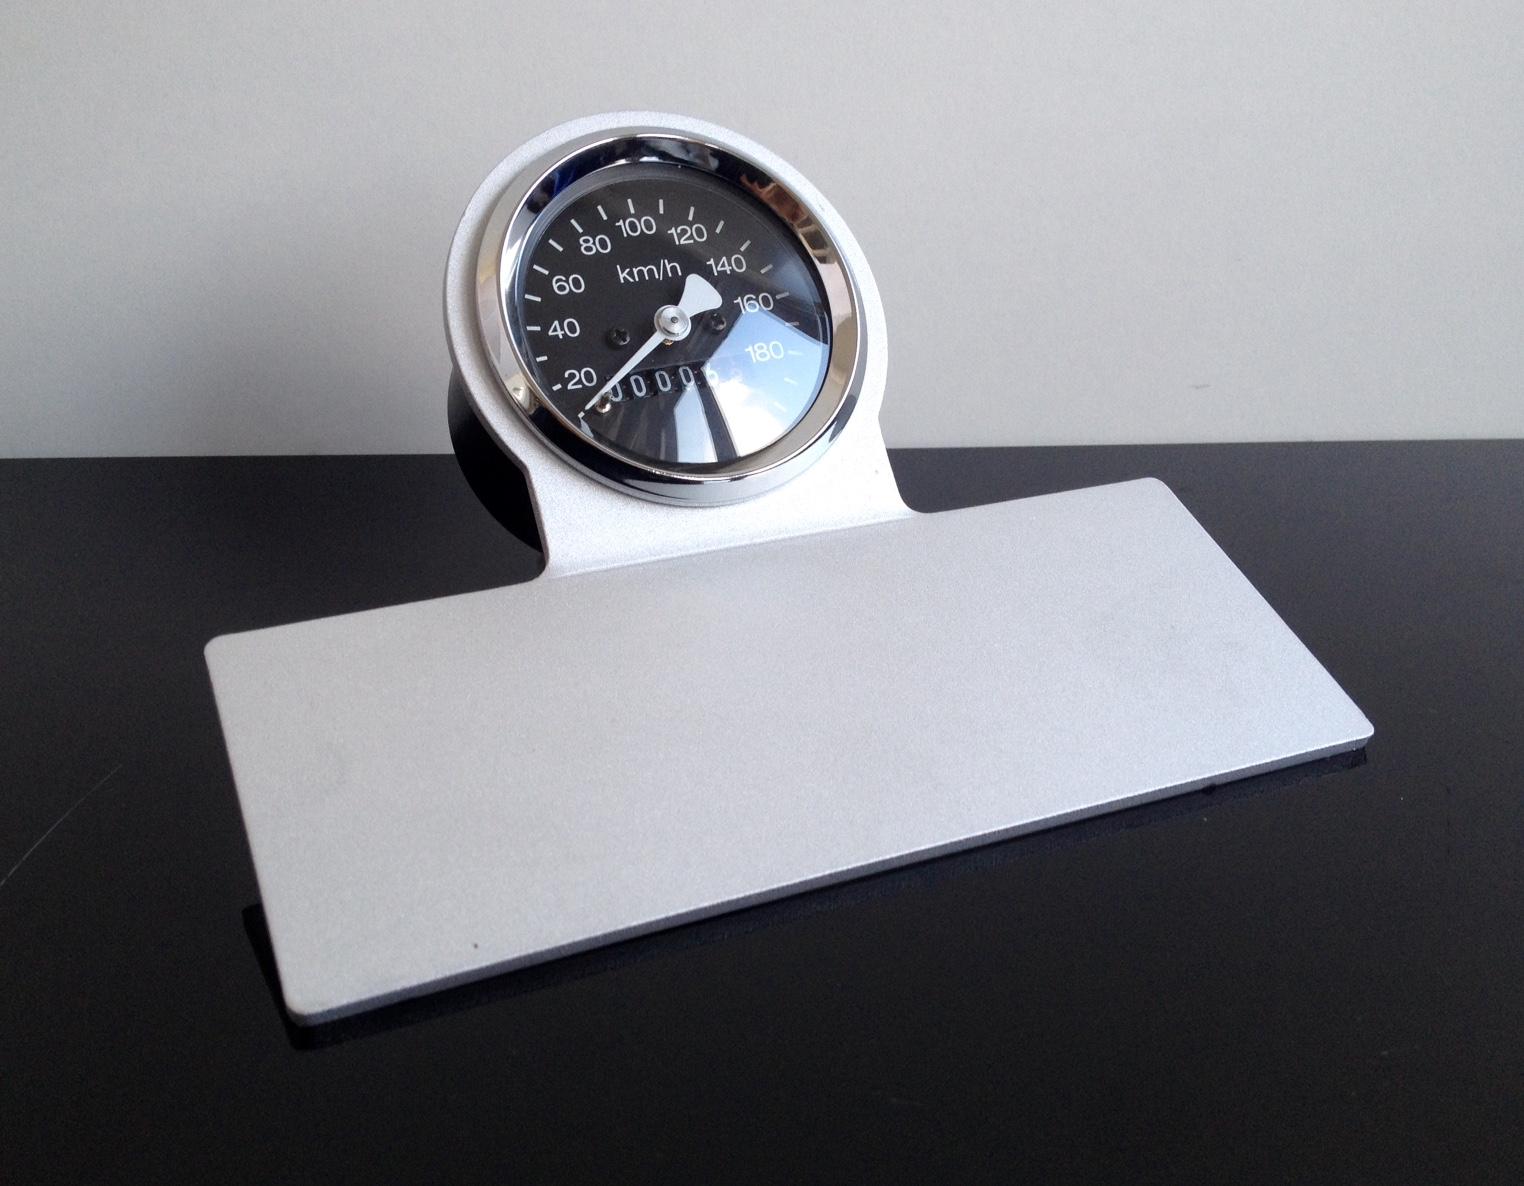 tachohalter speedo holder bracket cadre support compteur f 60mm tacho universal ebay. Black Bedroom Furniture Sets. Home Design Ideas